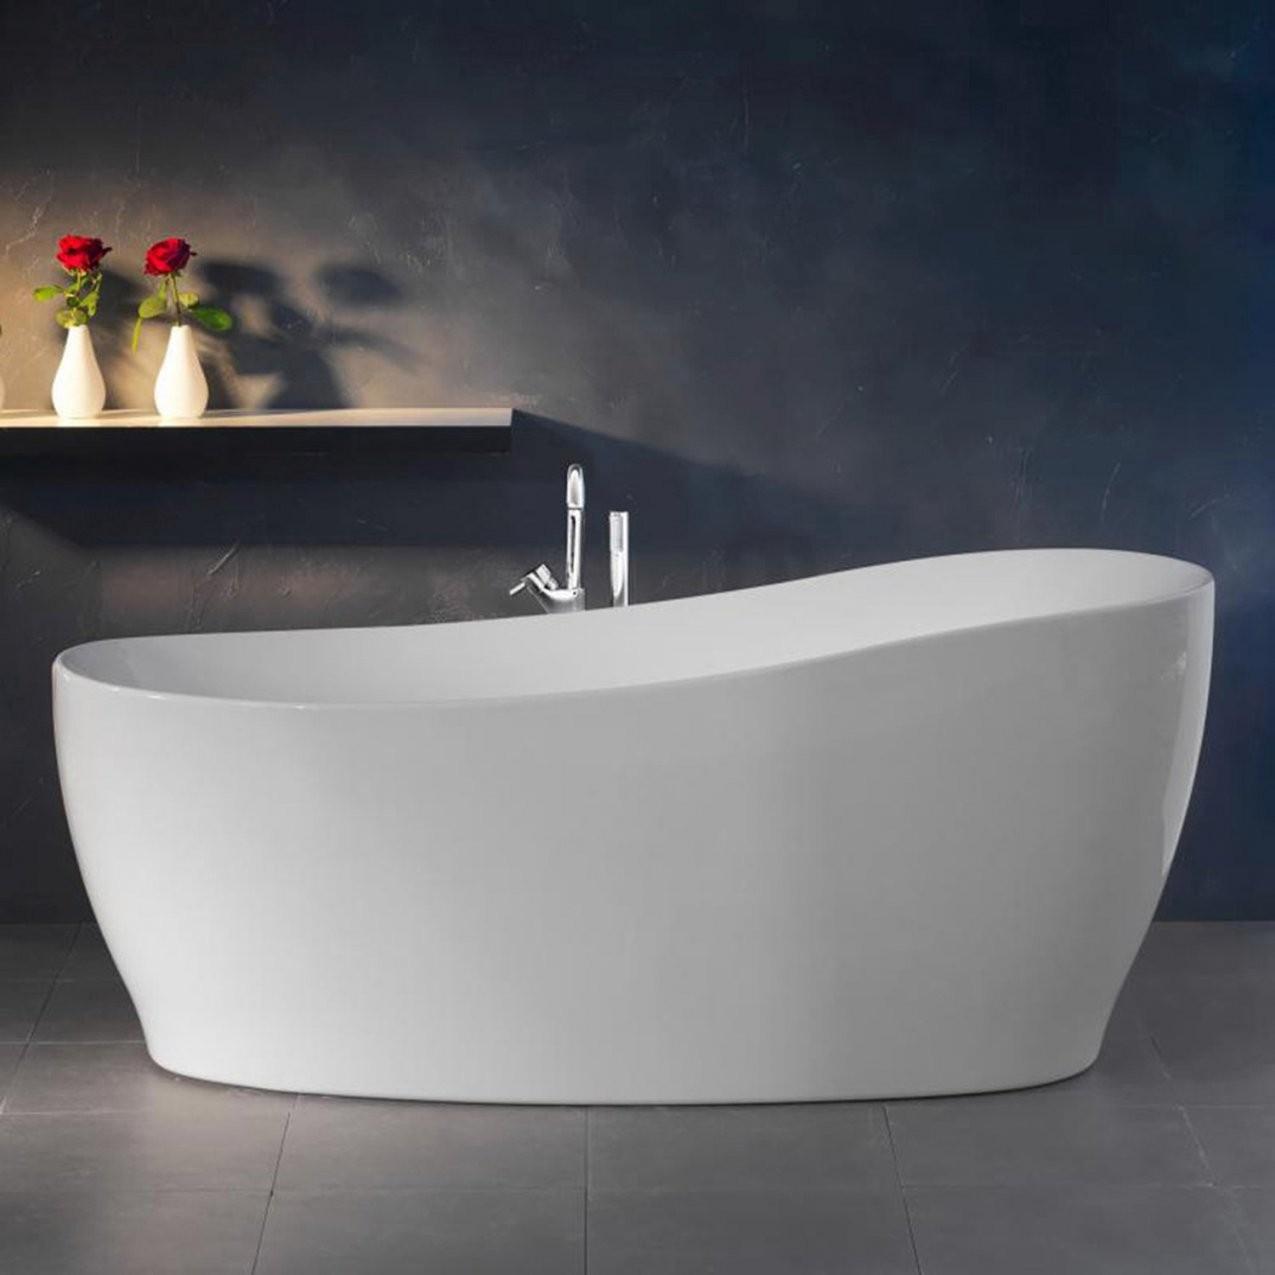 Freistehende Badewanne Aviva 180 Cm X 85 Cm Weiß Kaufen Bei Obi von Ovale Freistehende Badewanne Bild